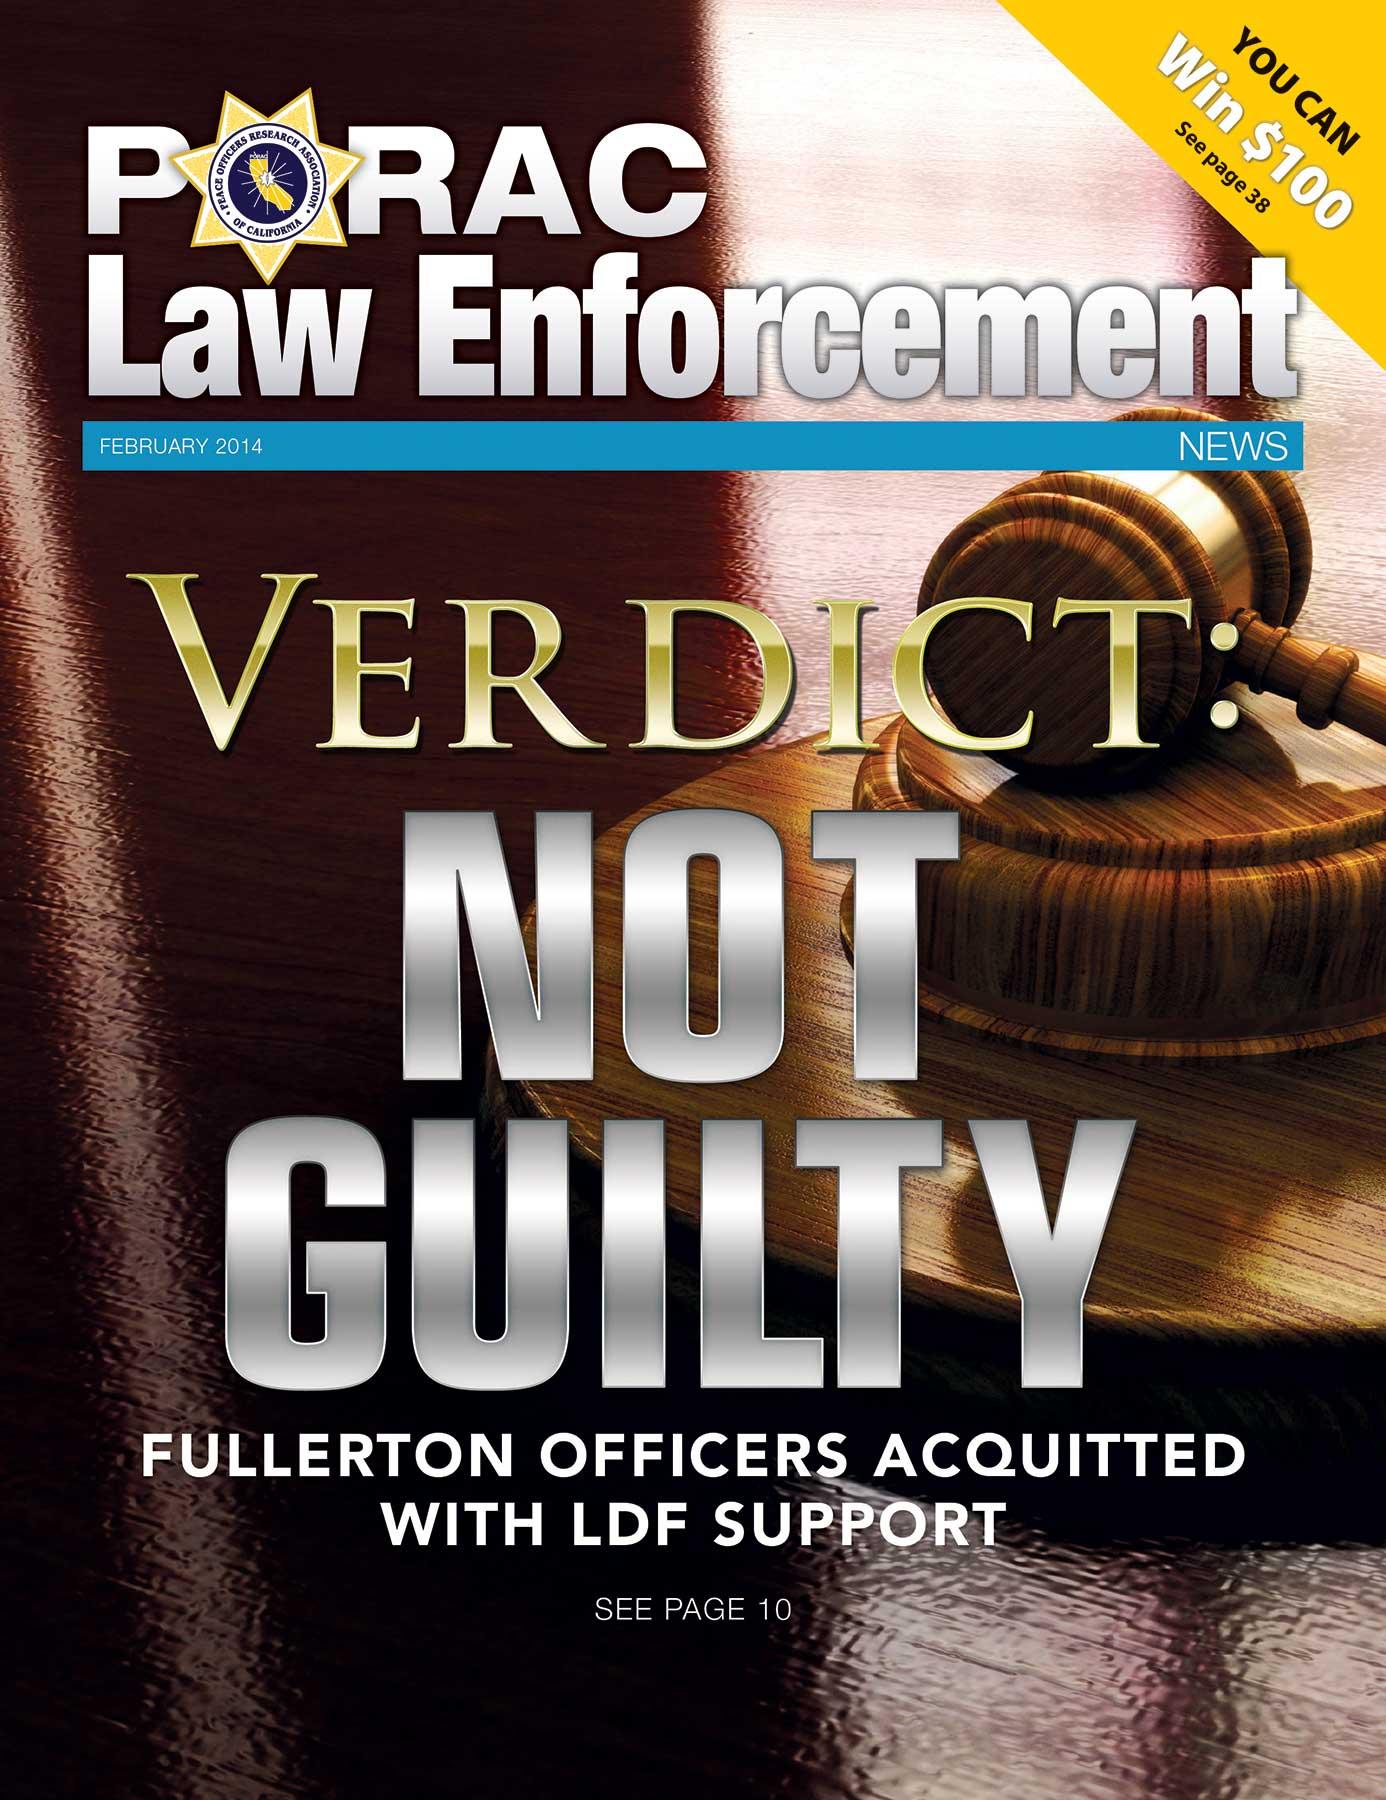 PORAC Law Enforcement News –  February 2014